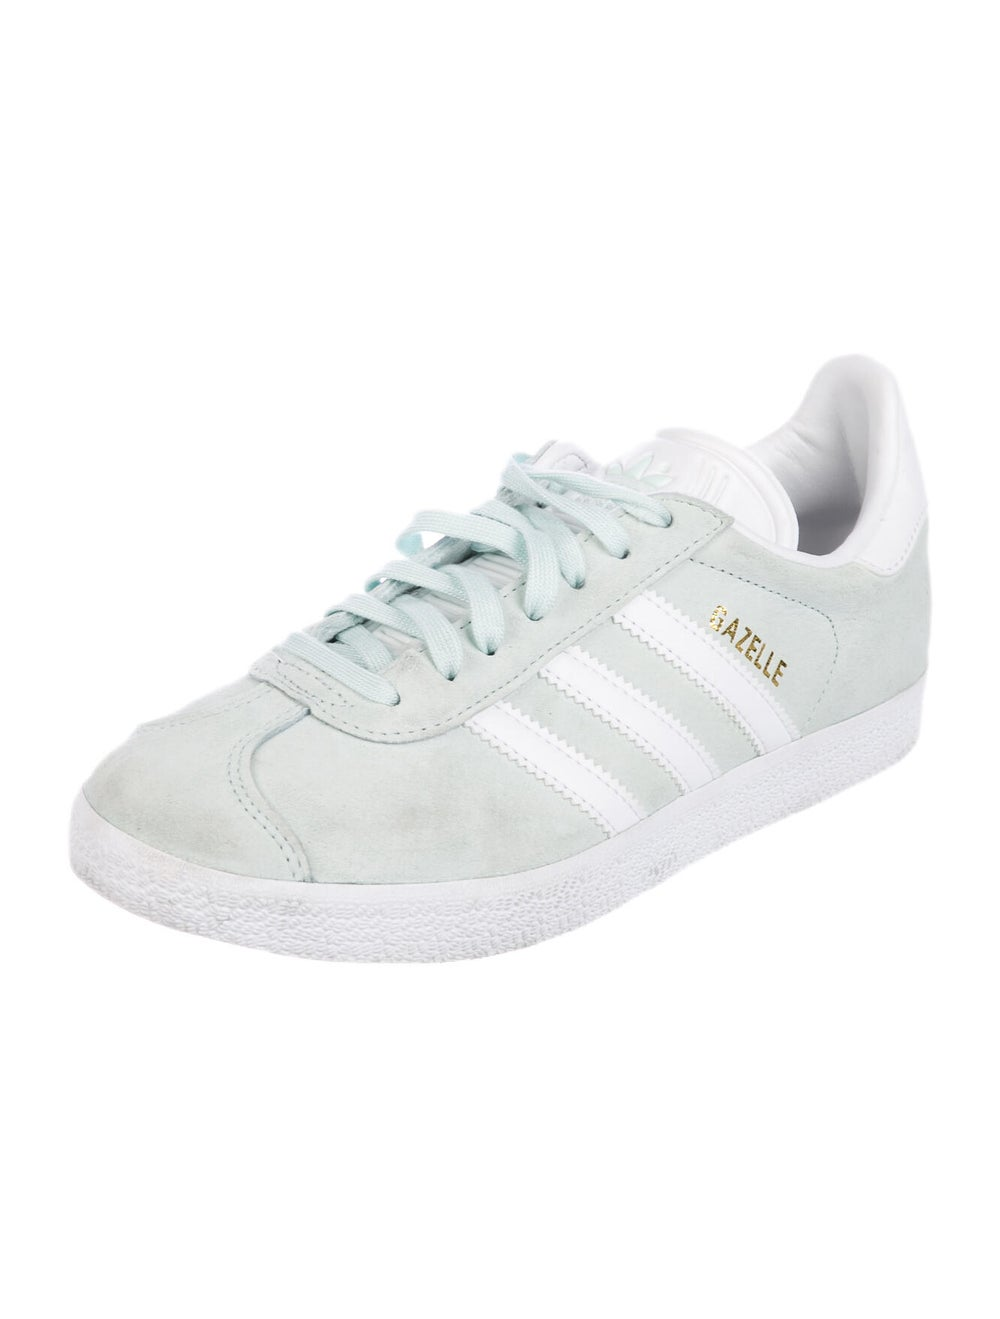 Adidas Gazelle Sneakers Green - image 2